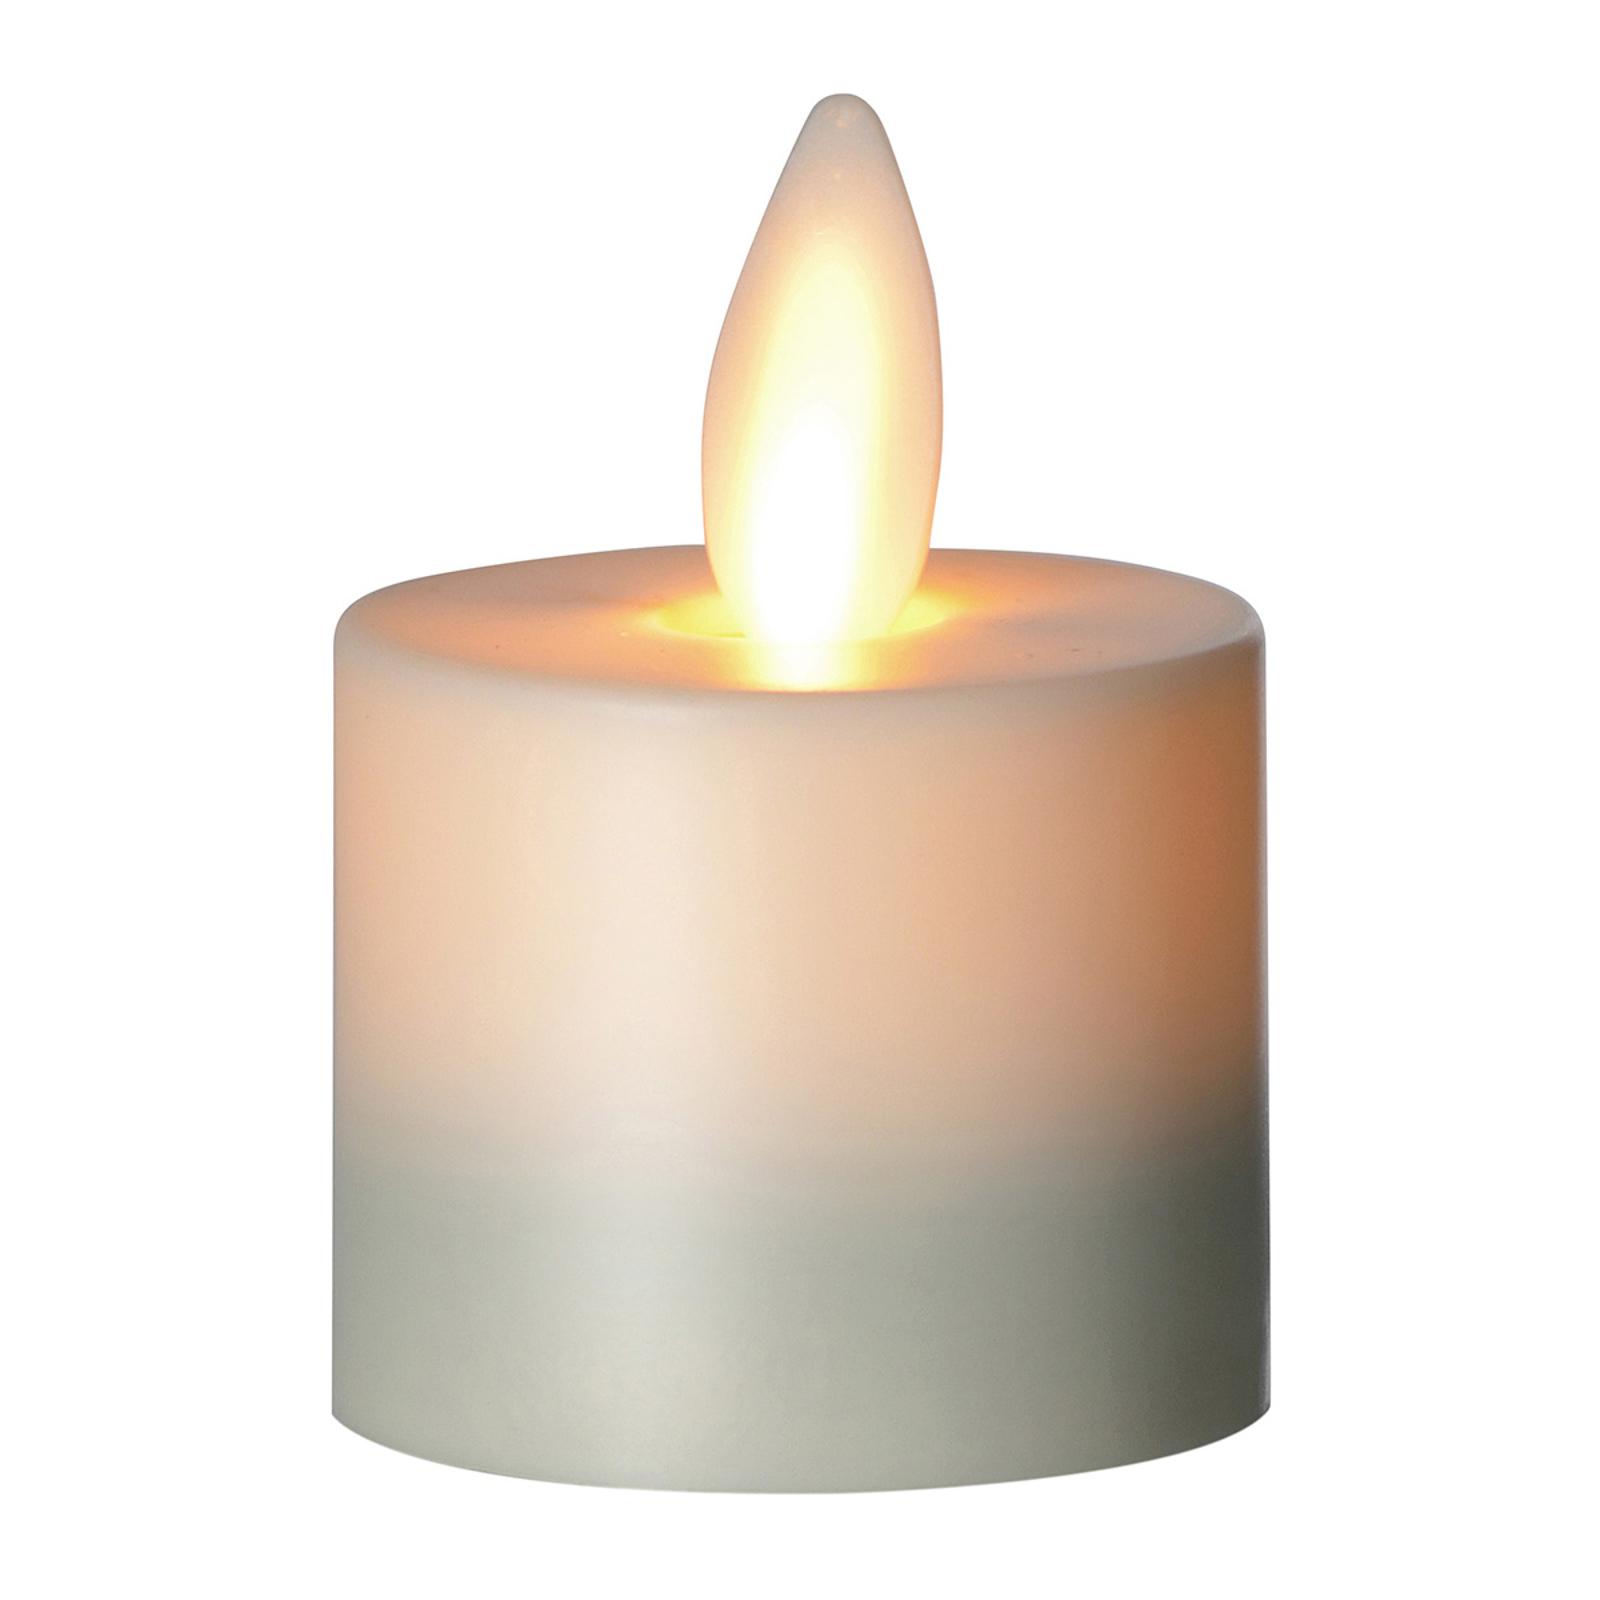 LED-kerte Flame fyrfadslys, 3,1 cm